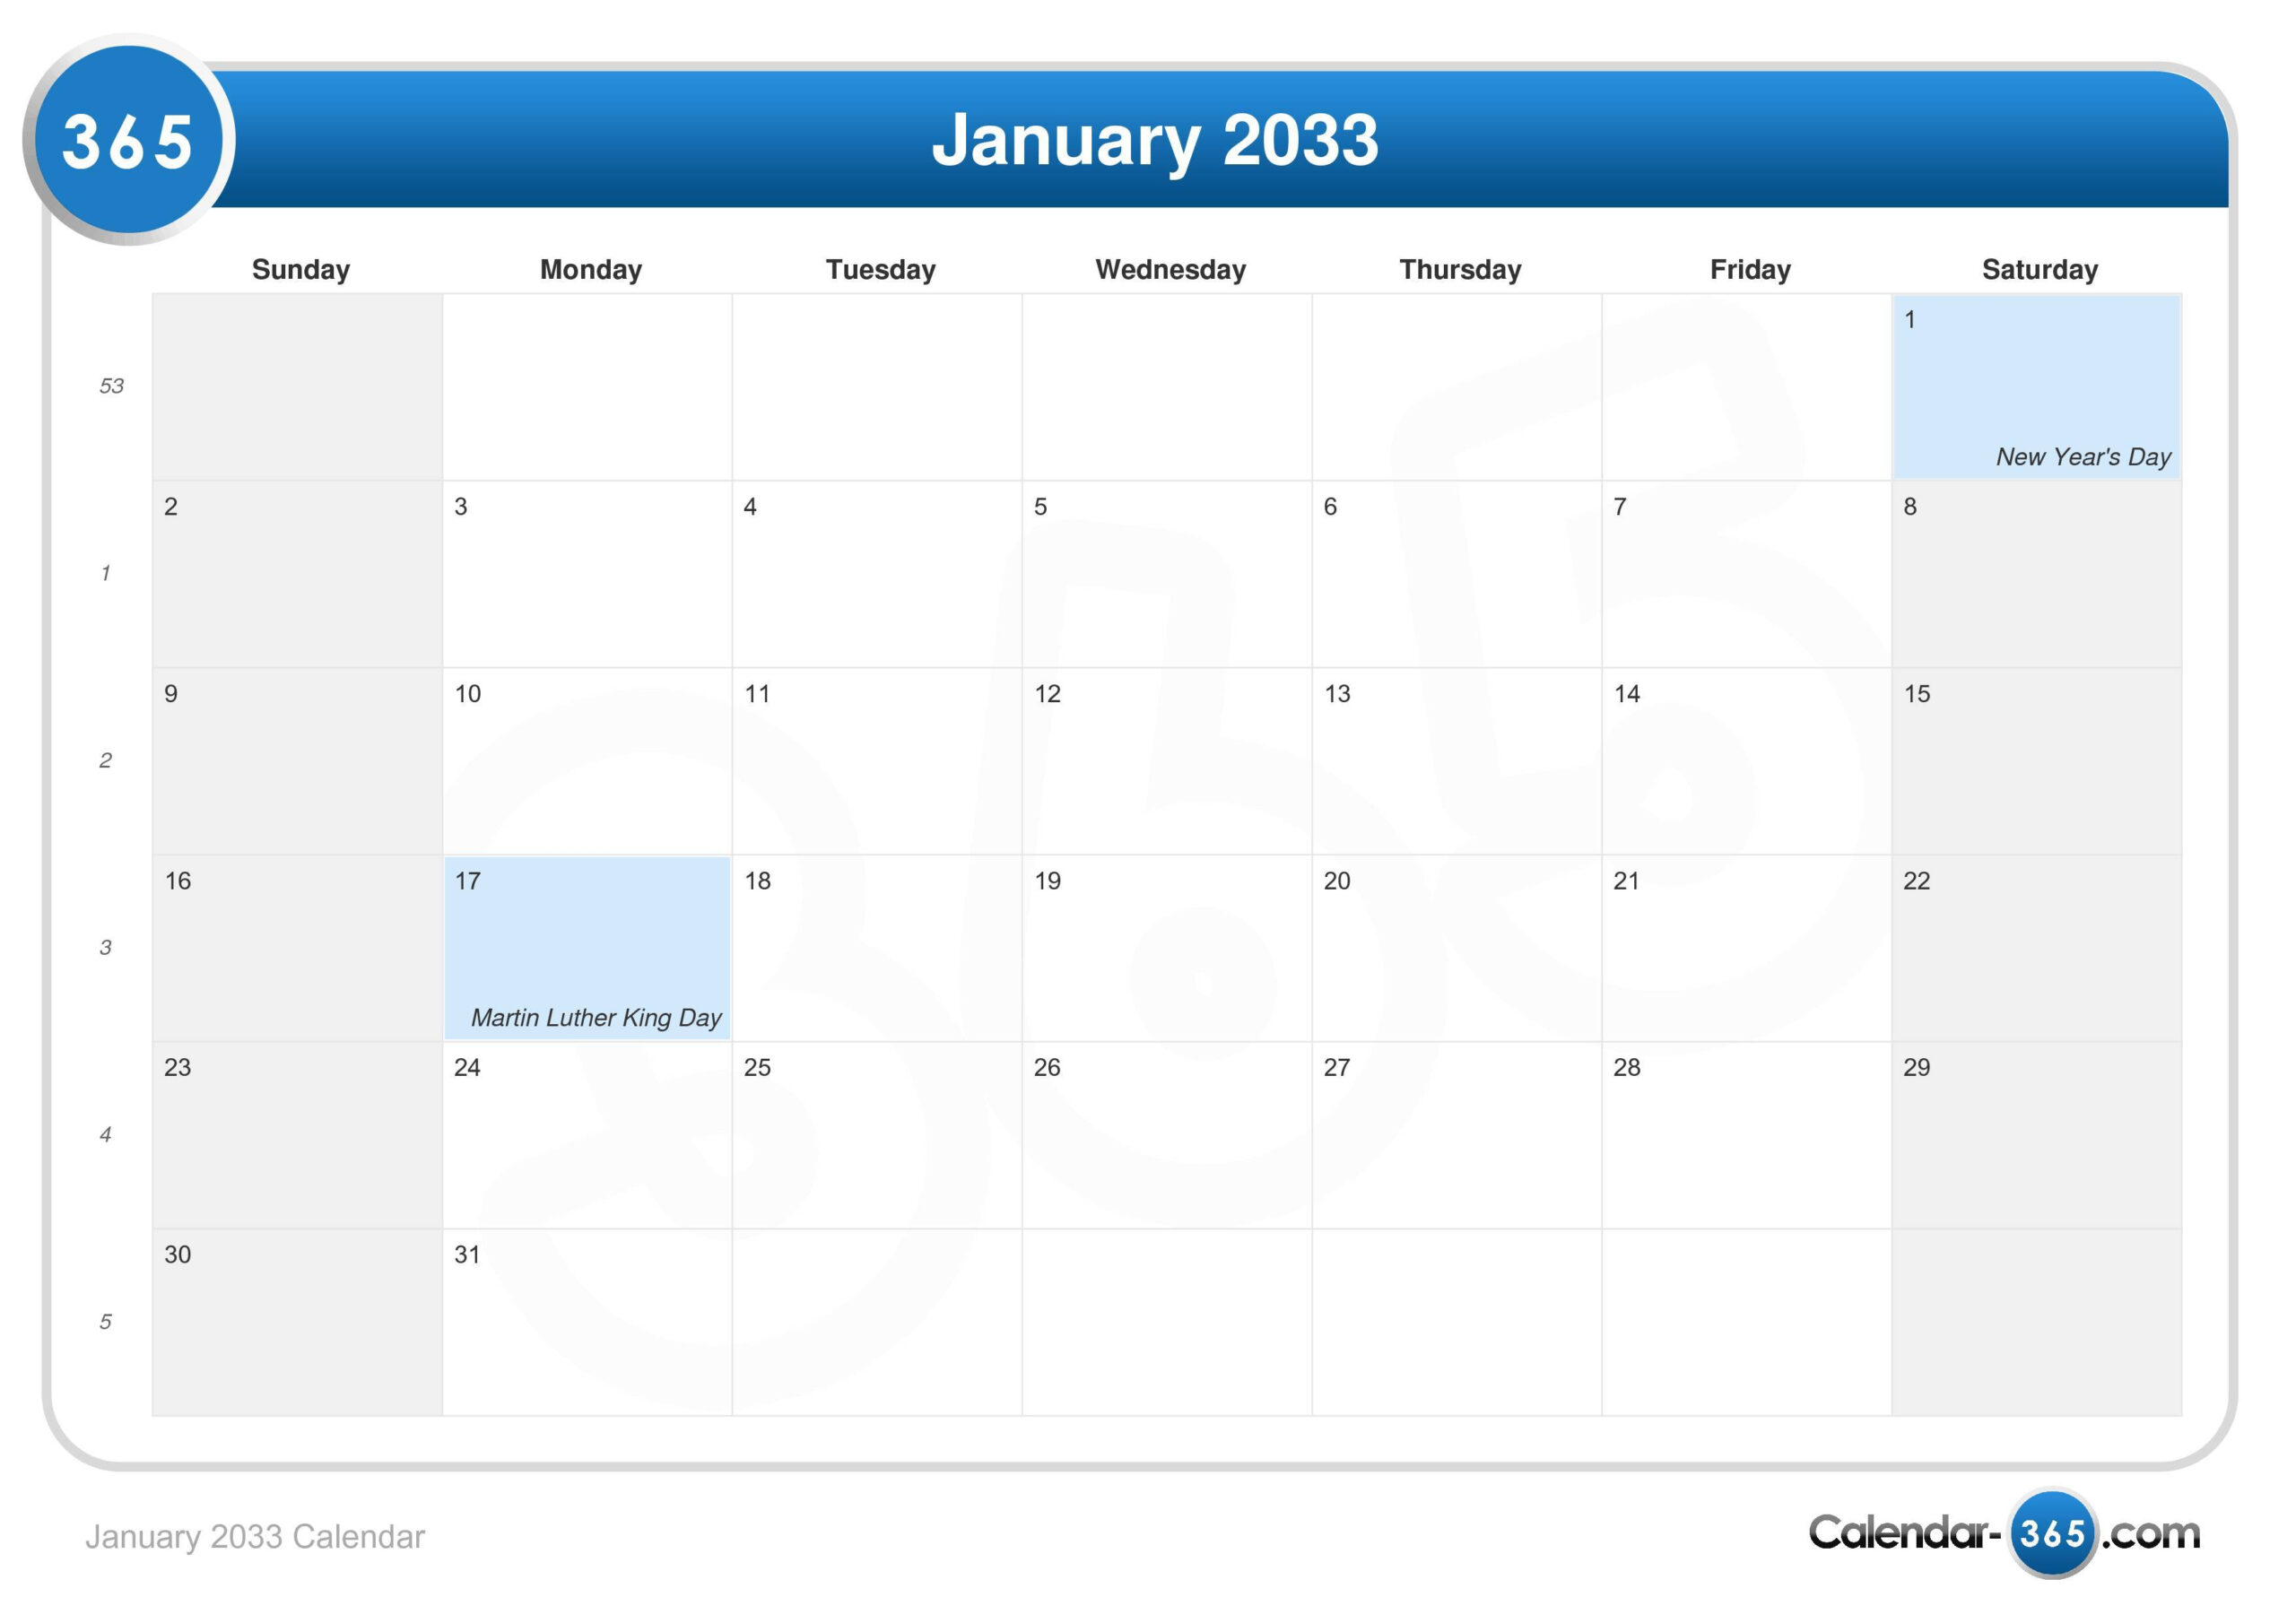 January 2033 Calendar